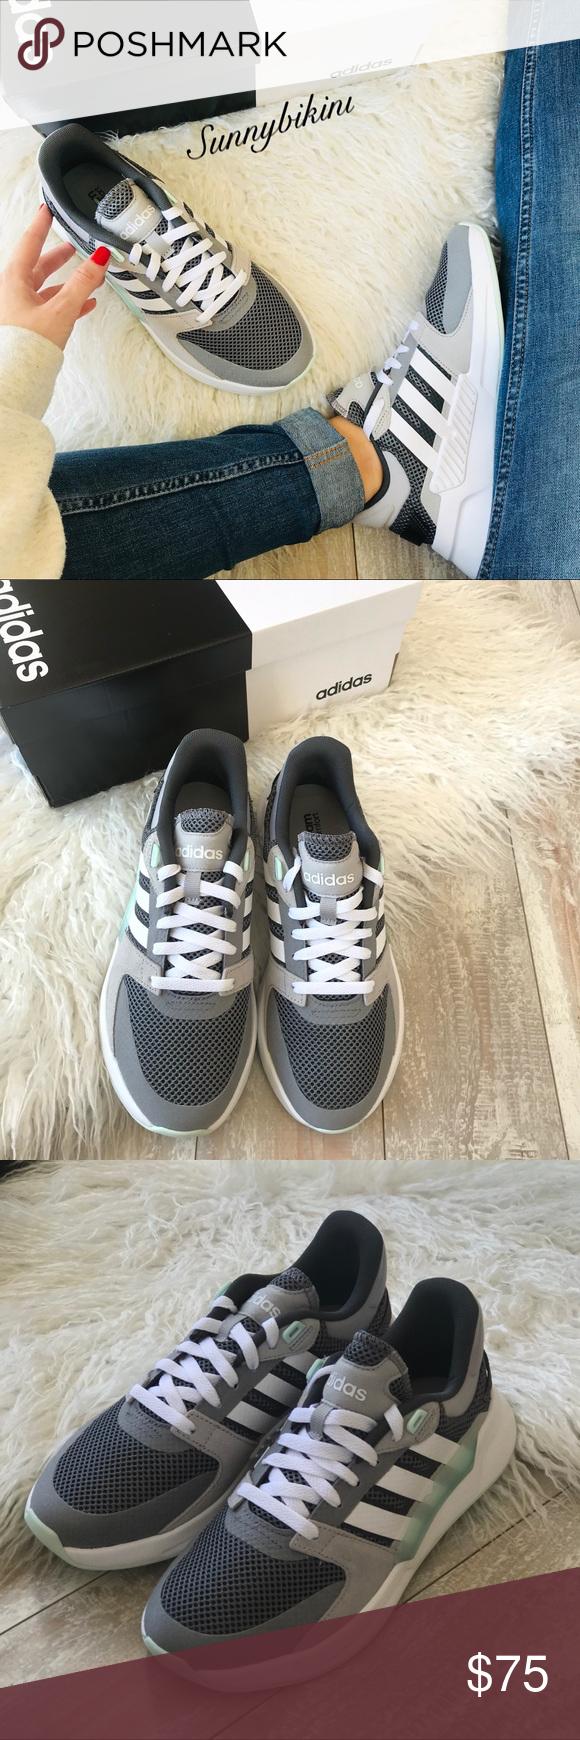 NWT Adidas Run 90S Women's Shoes